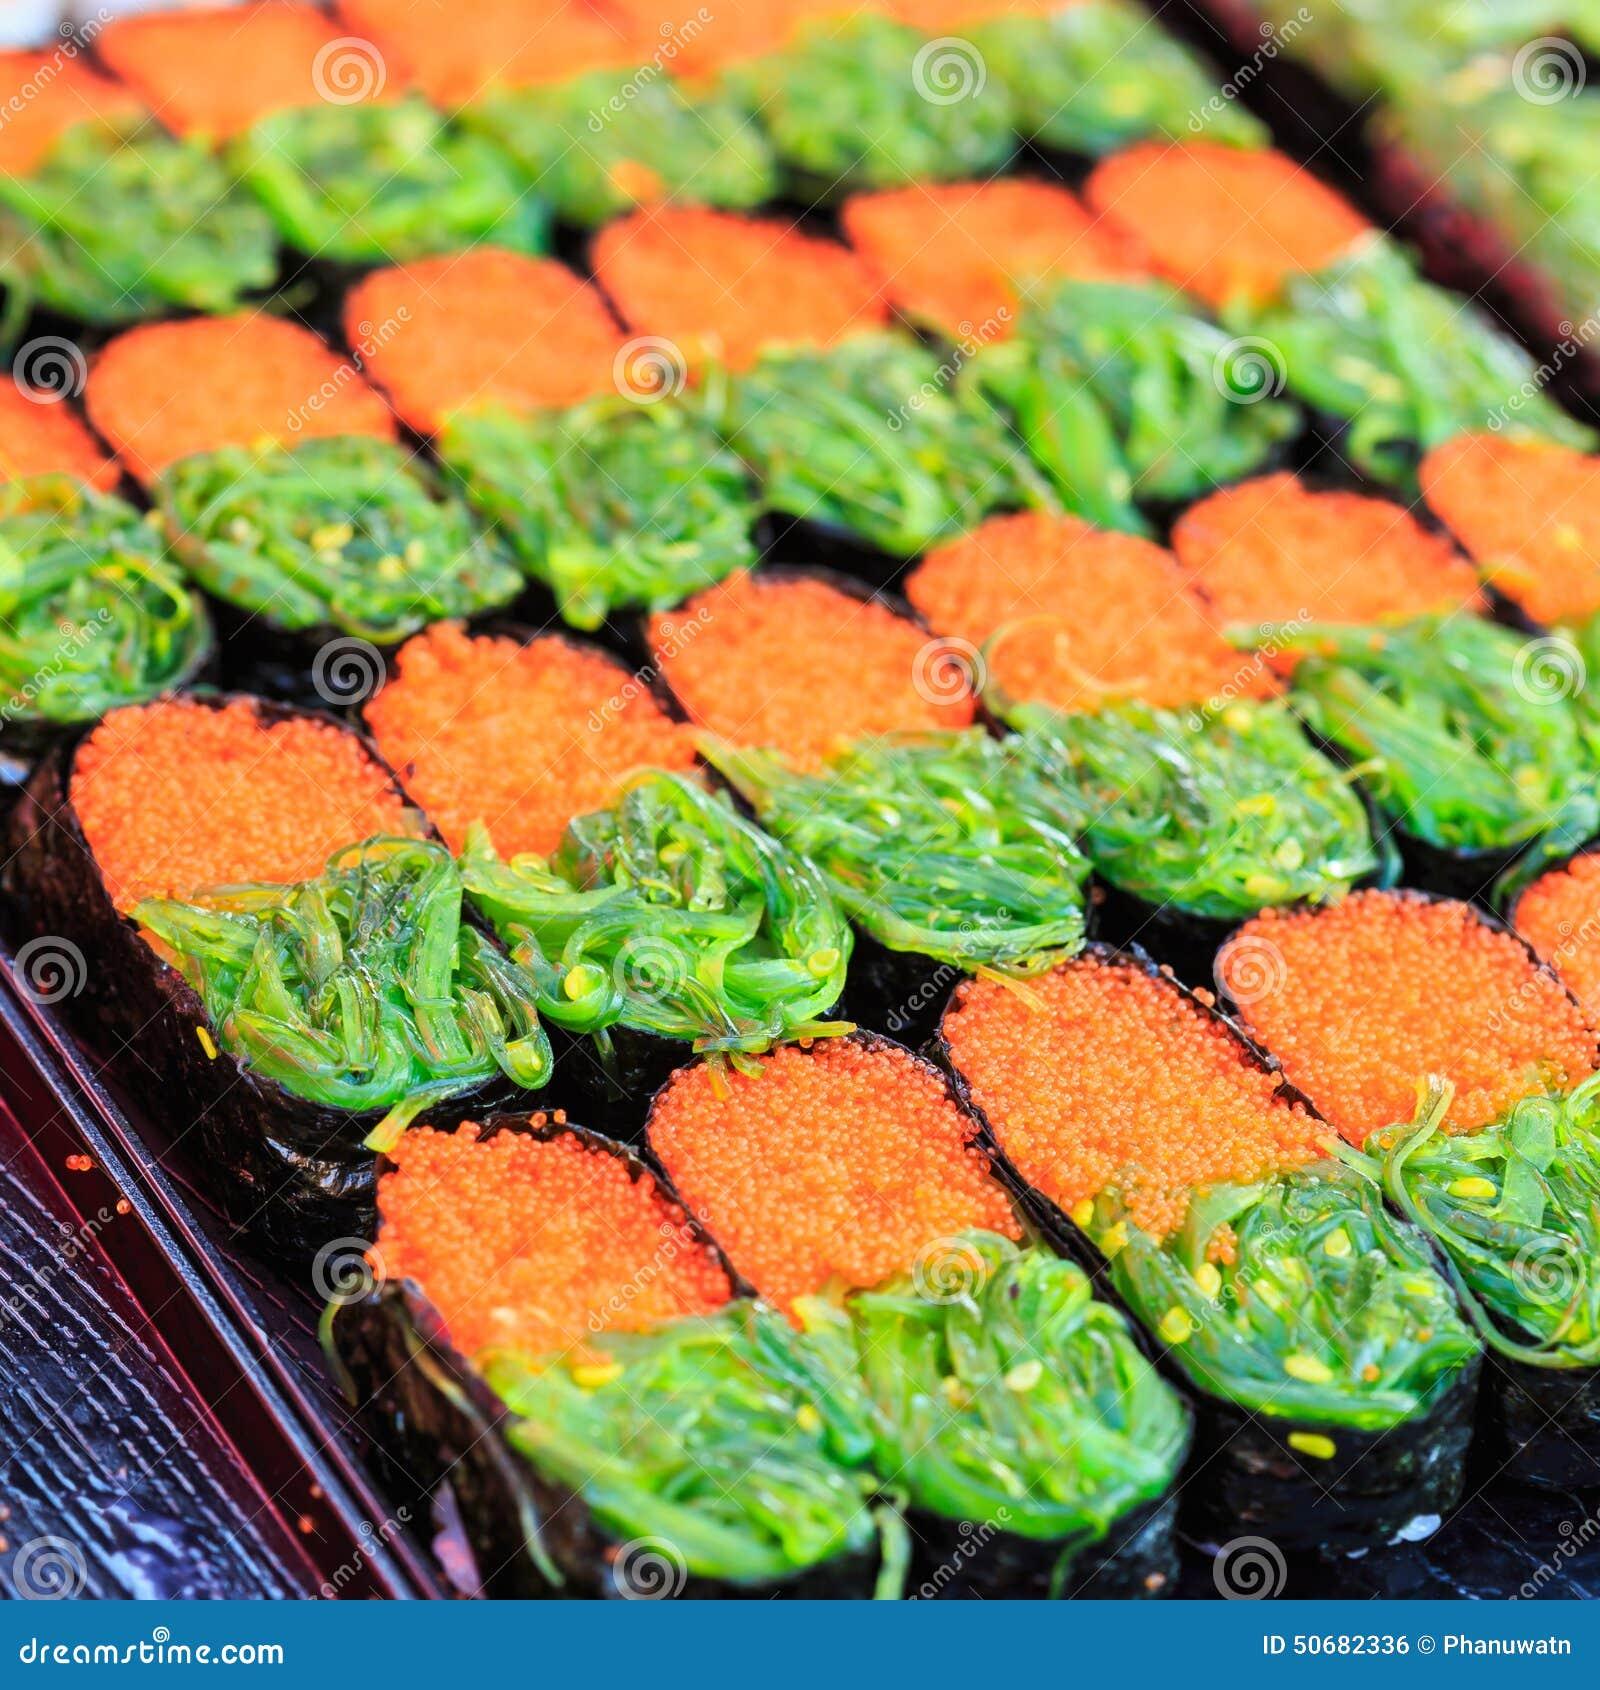 Download 传统食物日本的寿司 库存照片. 图片 包括有 文化, 食物, 蔬菜, 日语, 空白, 传统, 餐馆, 可口 - 50682336